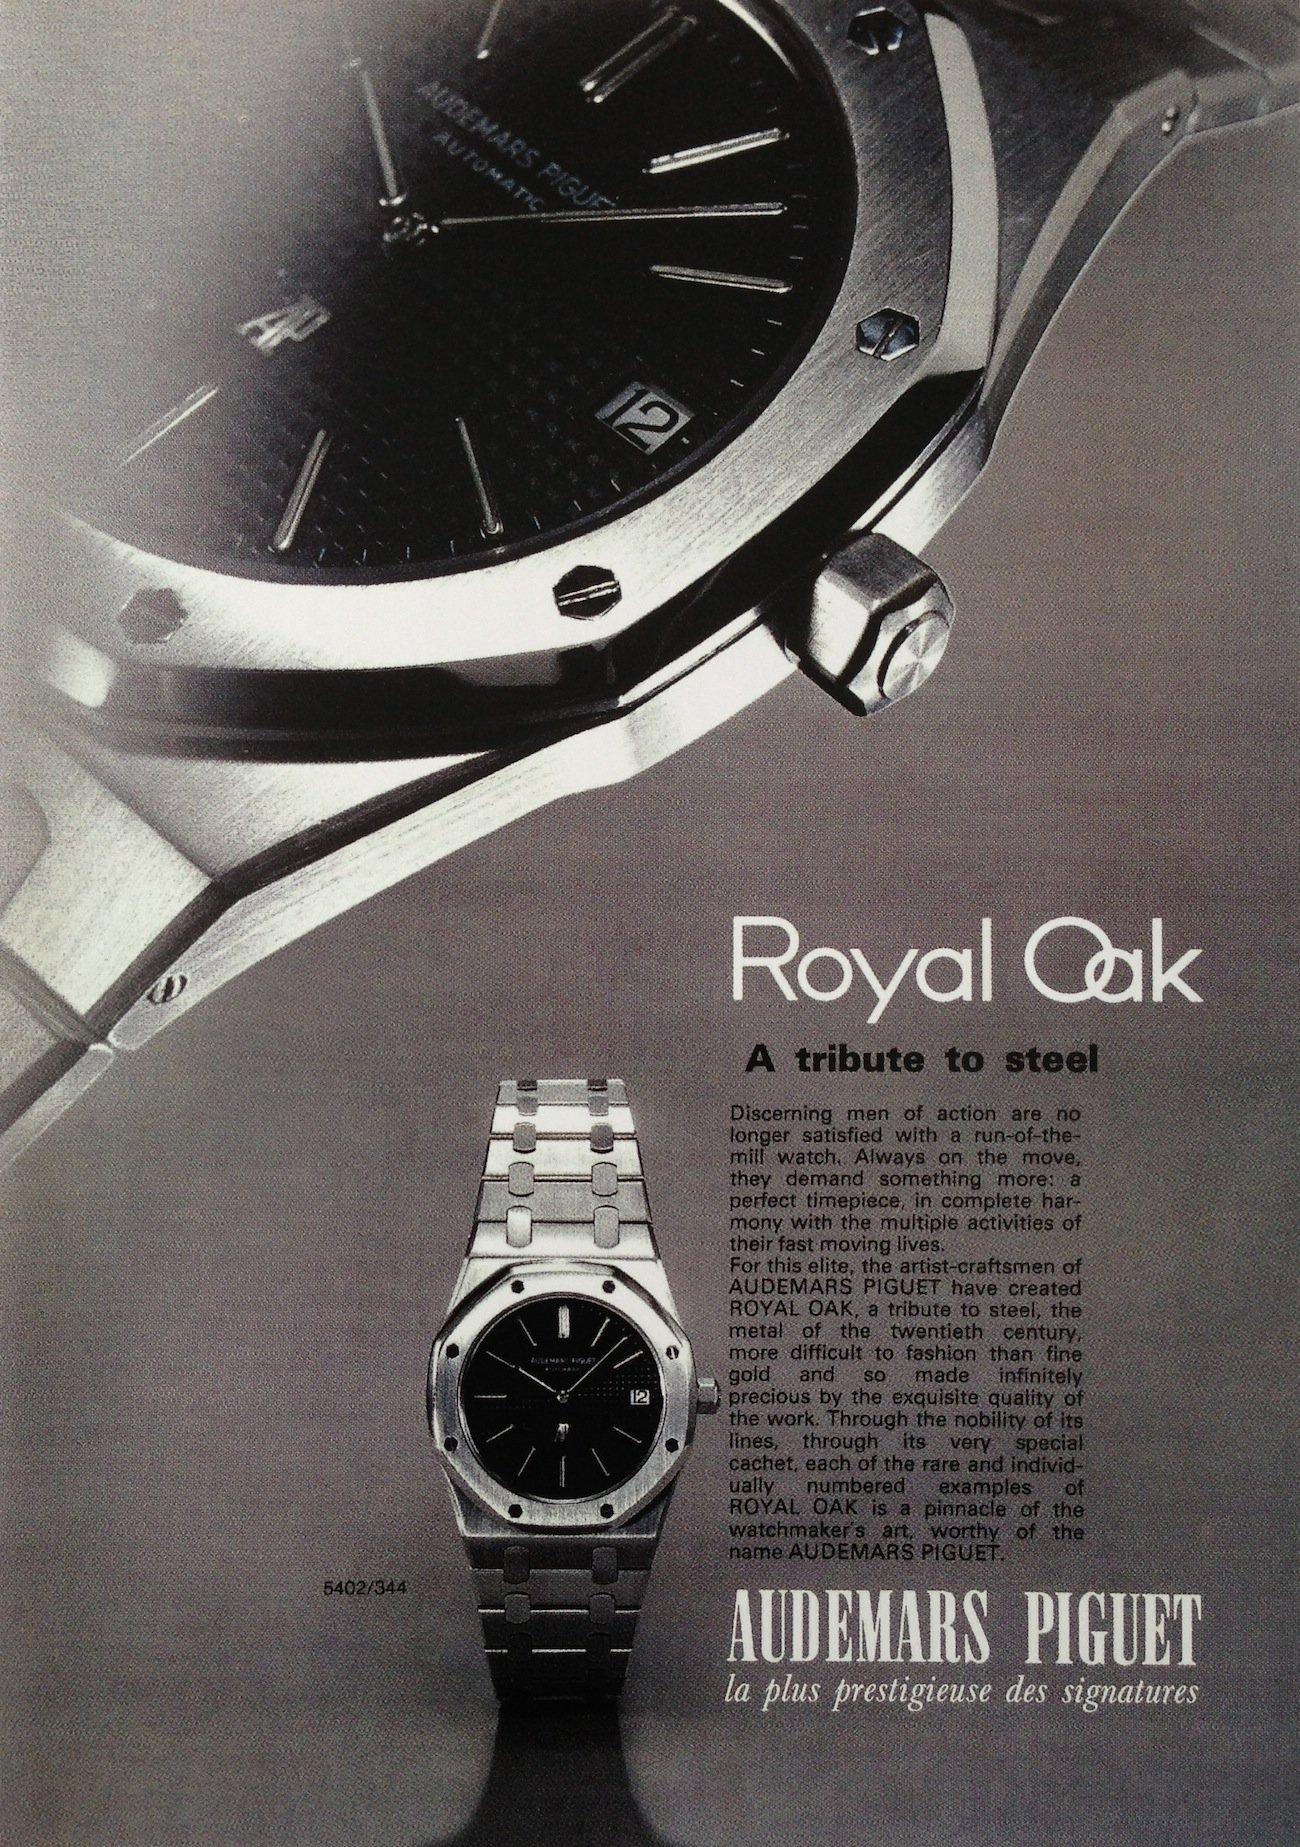 Audemars-Piguet-Royal-Oak-Vintage-Anzeige-Reklame-erste